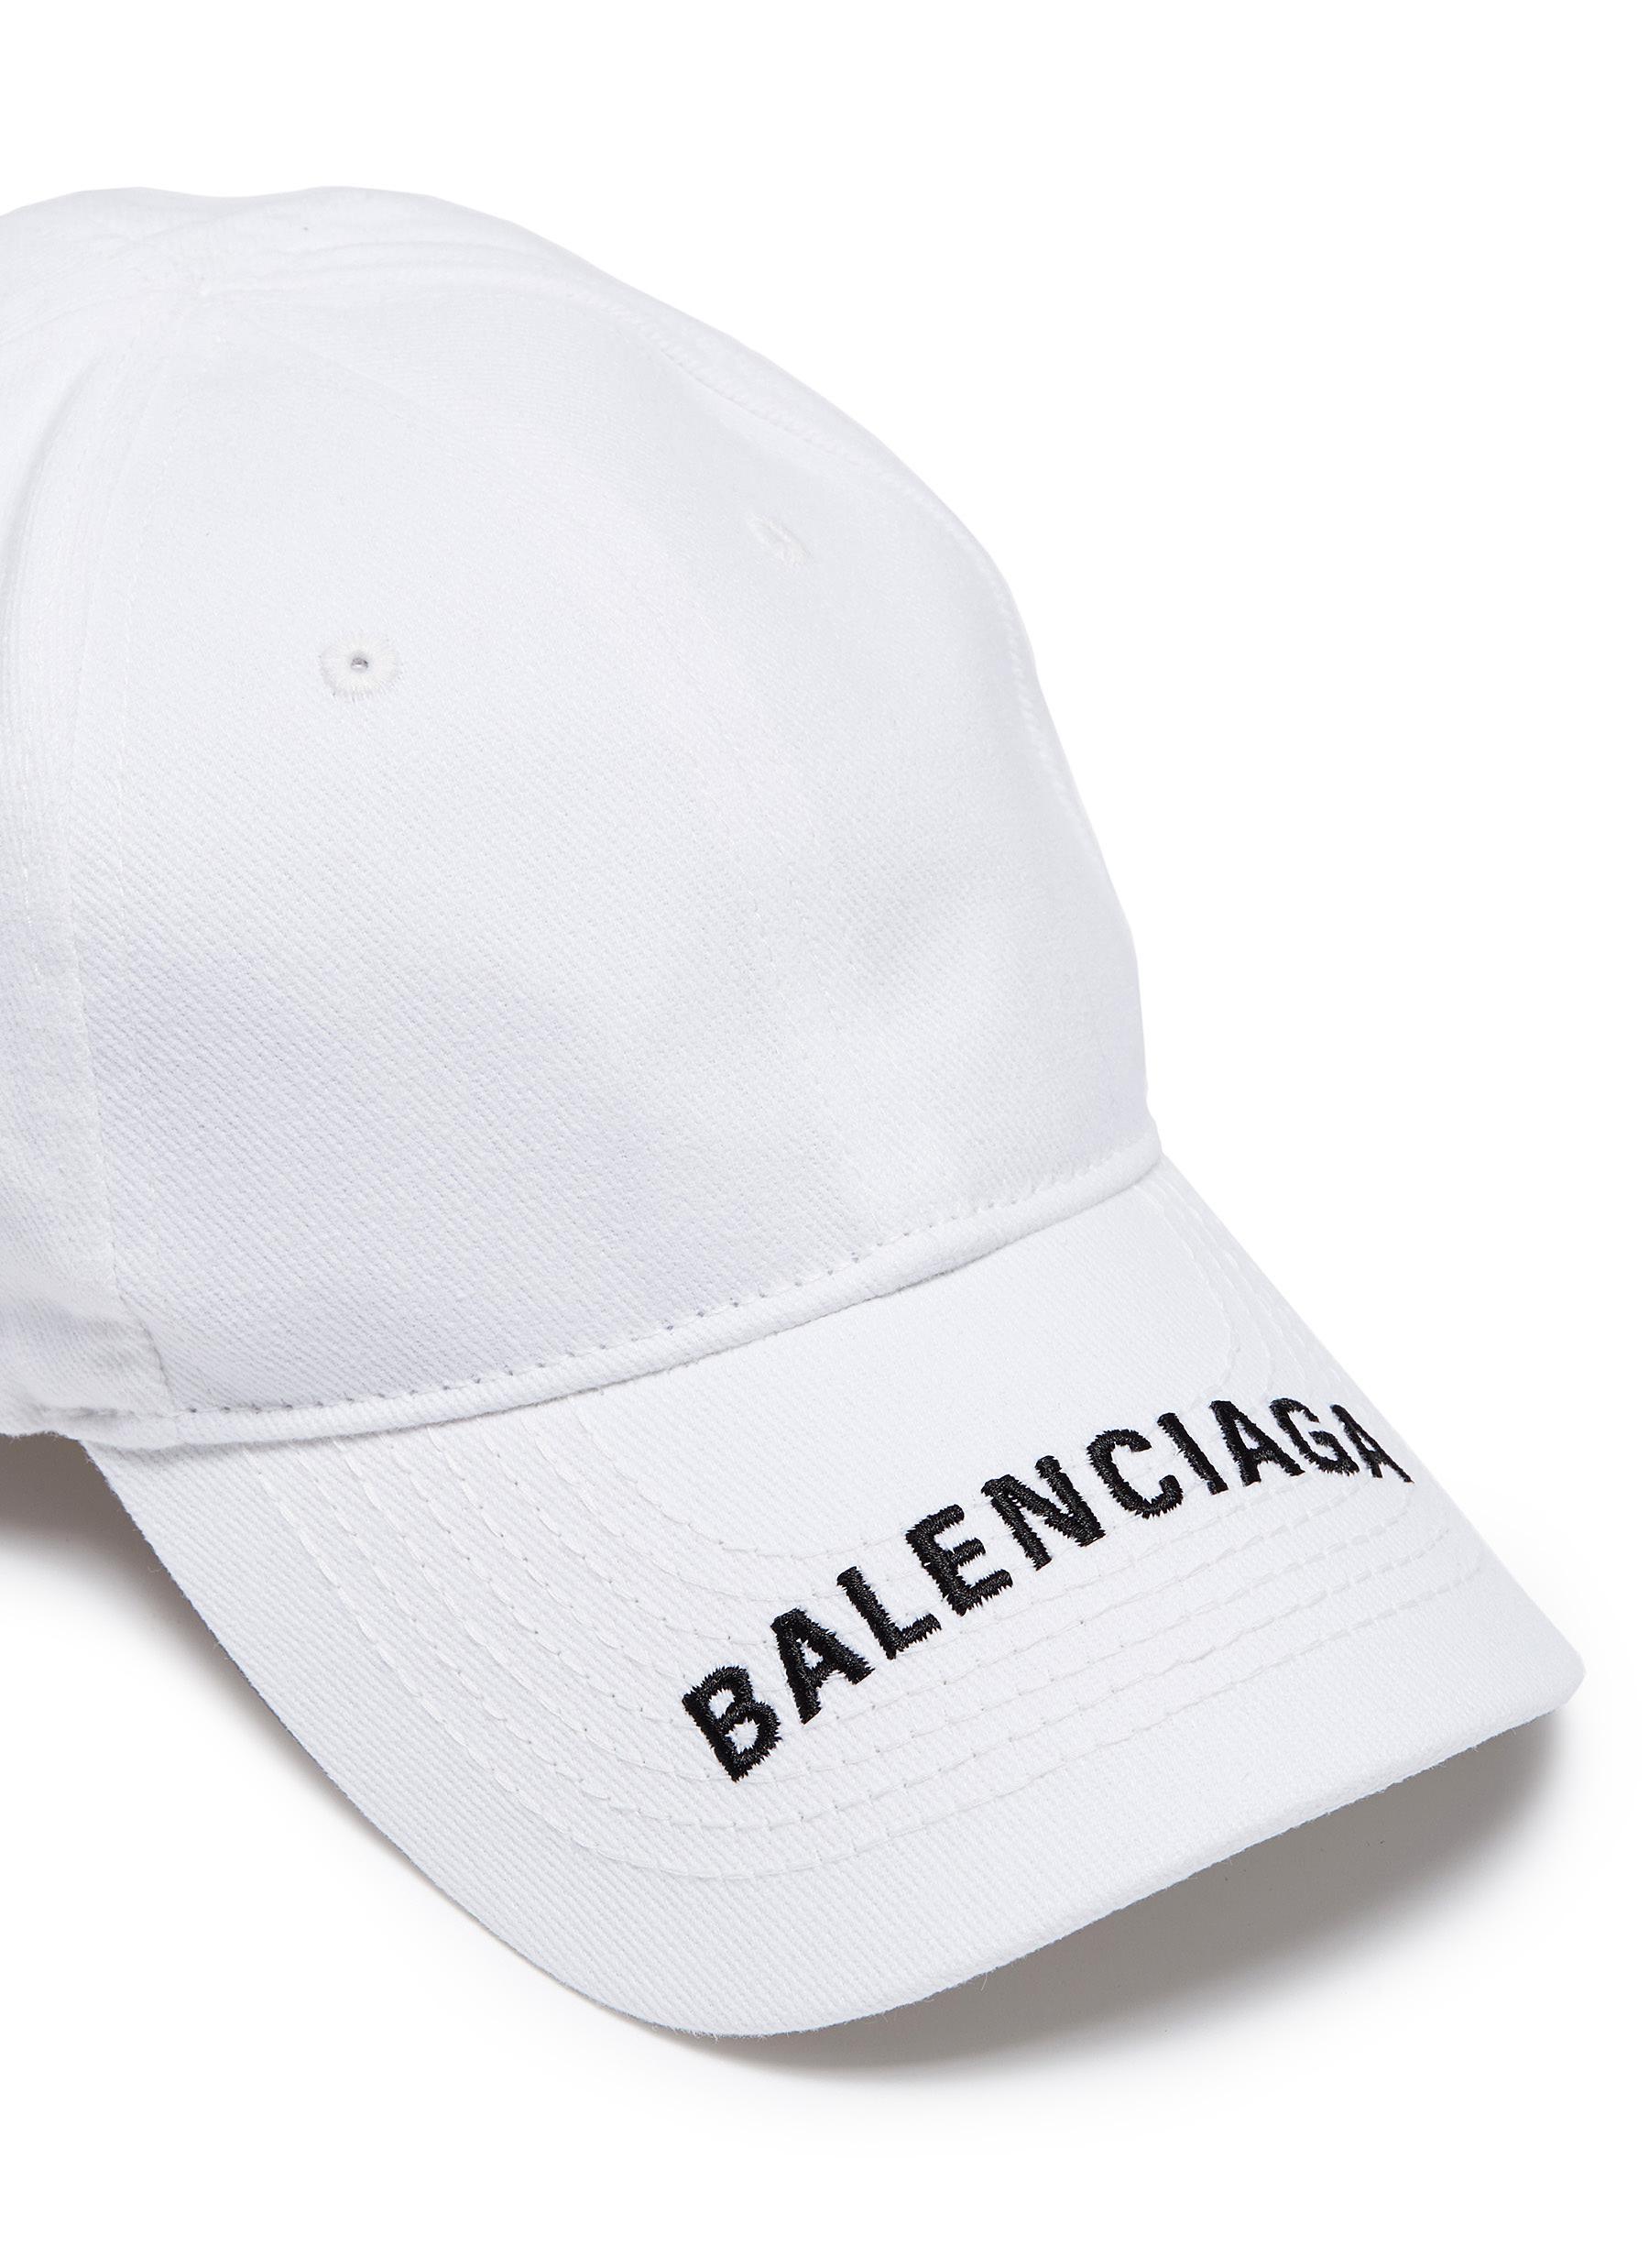 45843ca34e4 Lyst - Balenciaga Logo Embroidered Cotton Cap in White for Men ...